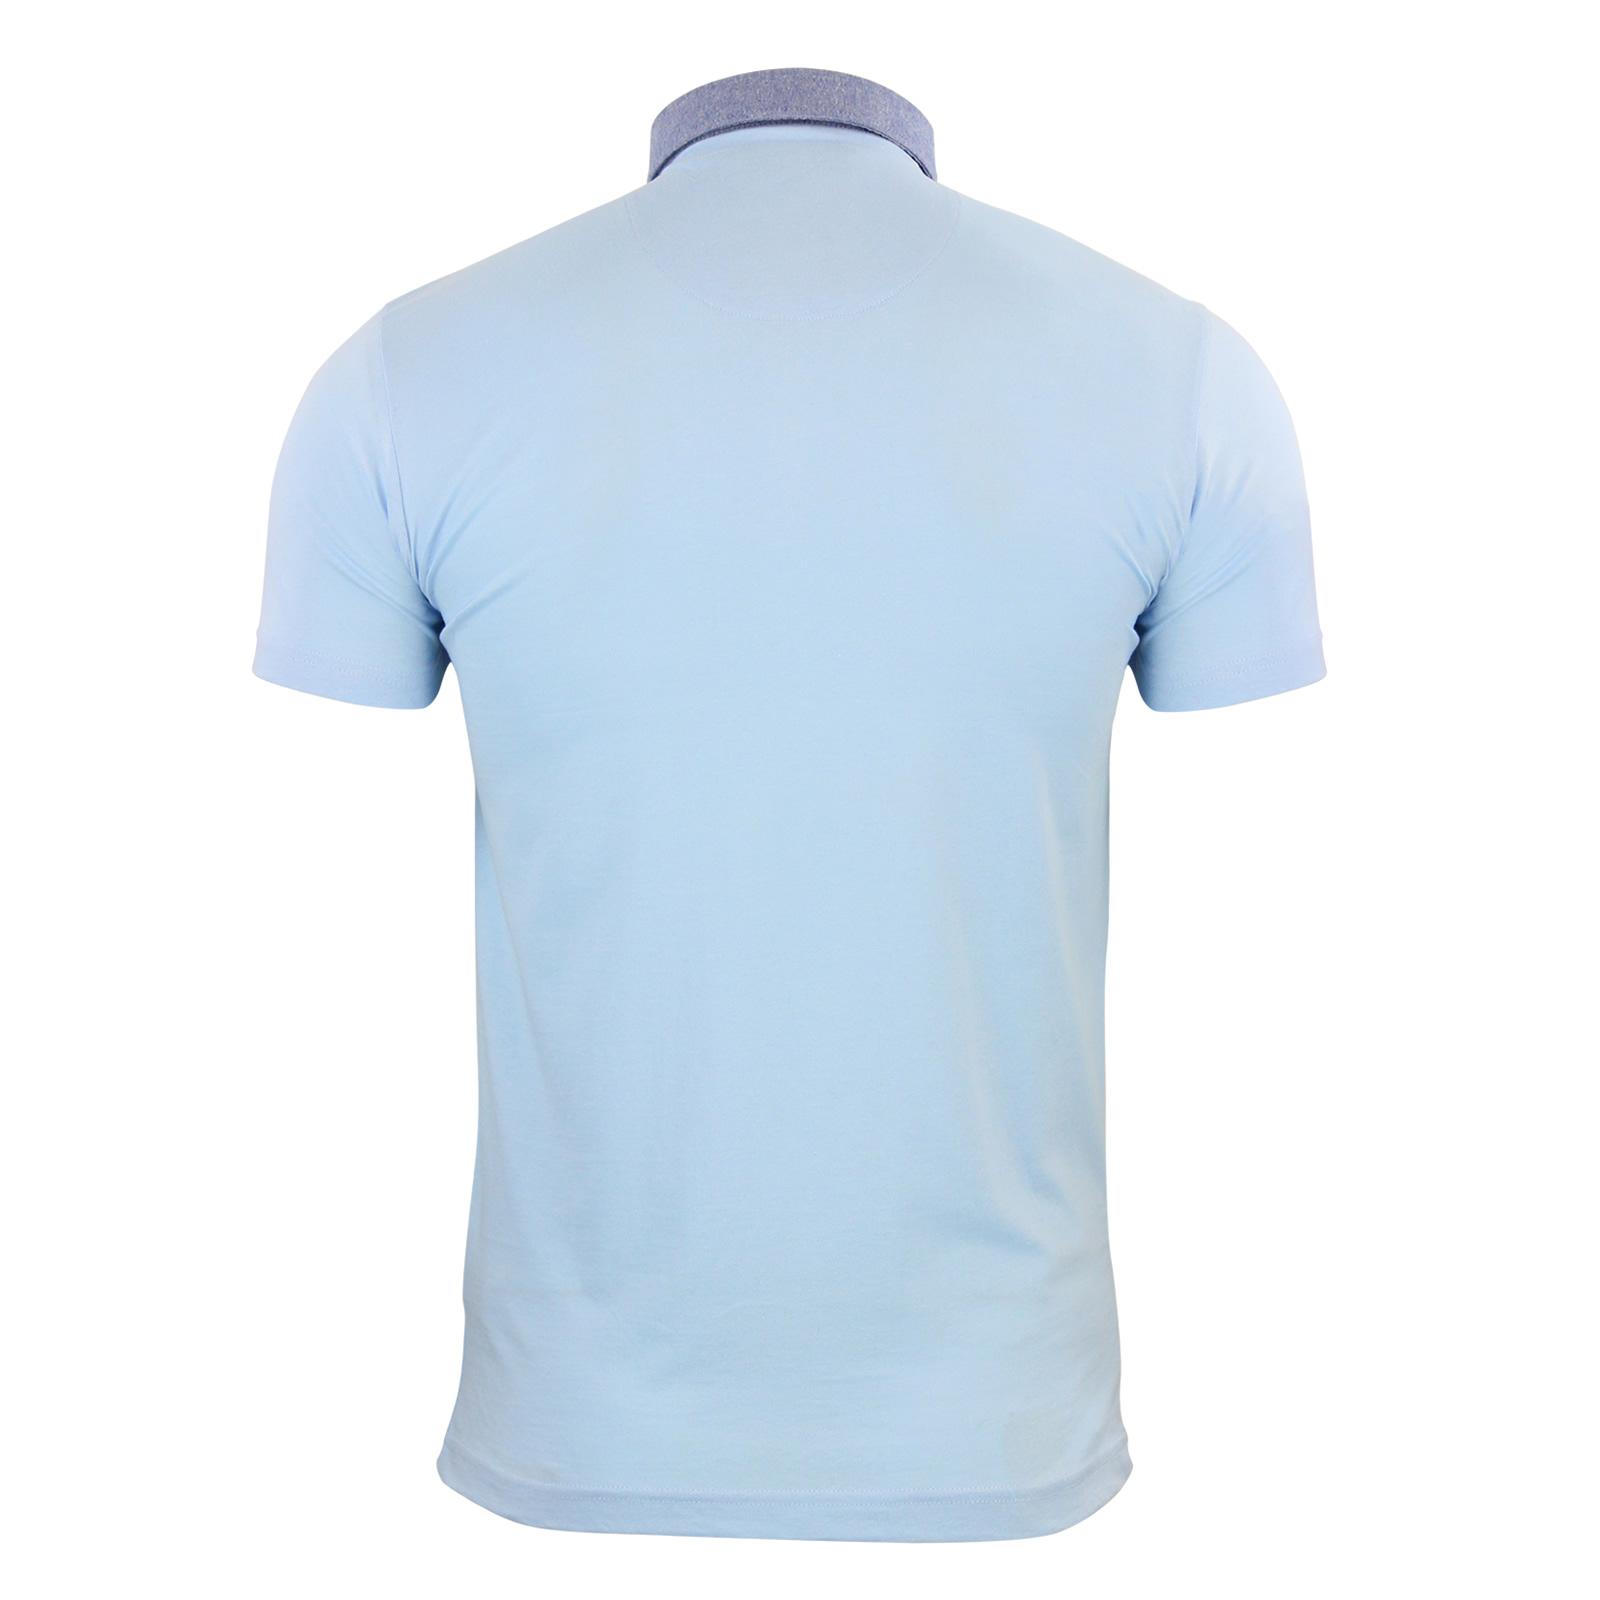 Mens-Polo-T-Shirt-Brave-Soul-Chimera-Chambray-Collared-Cotton-Casual-Top thumbnail 24